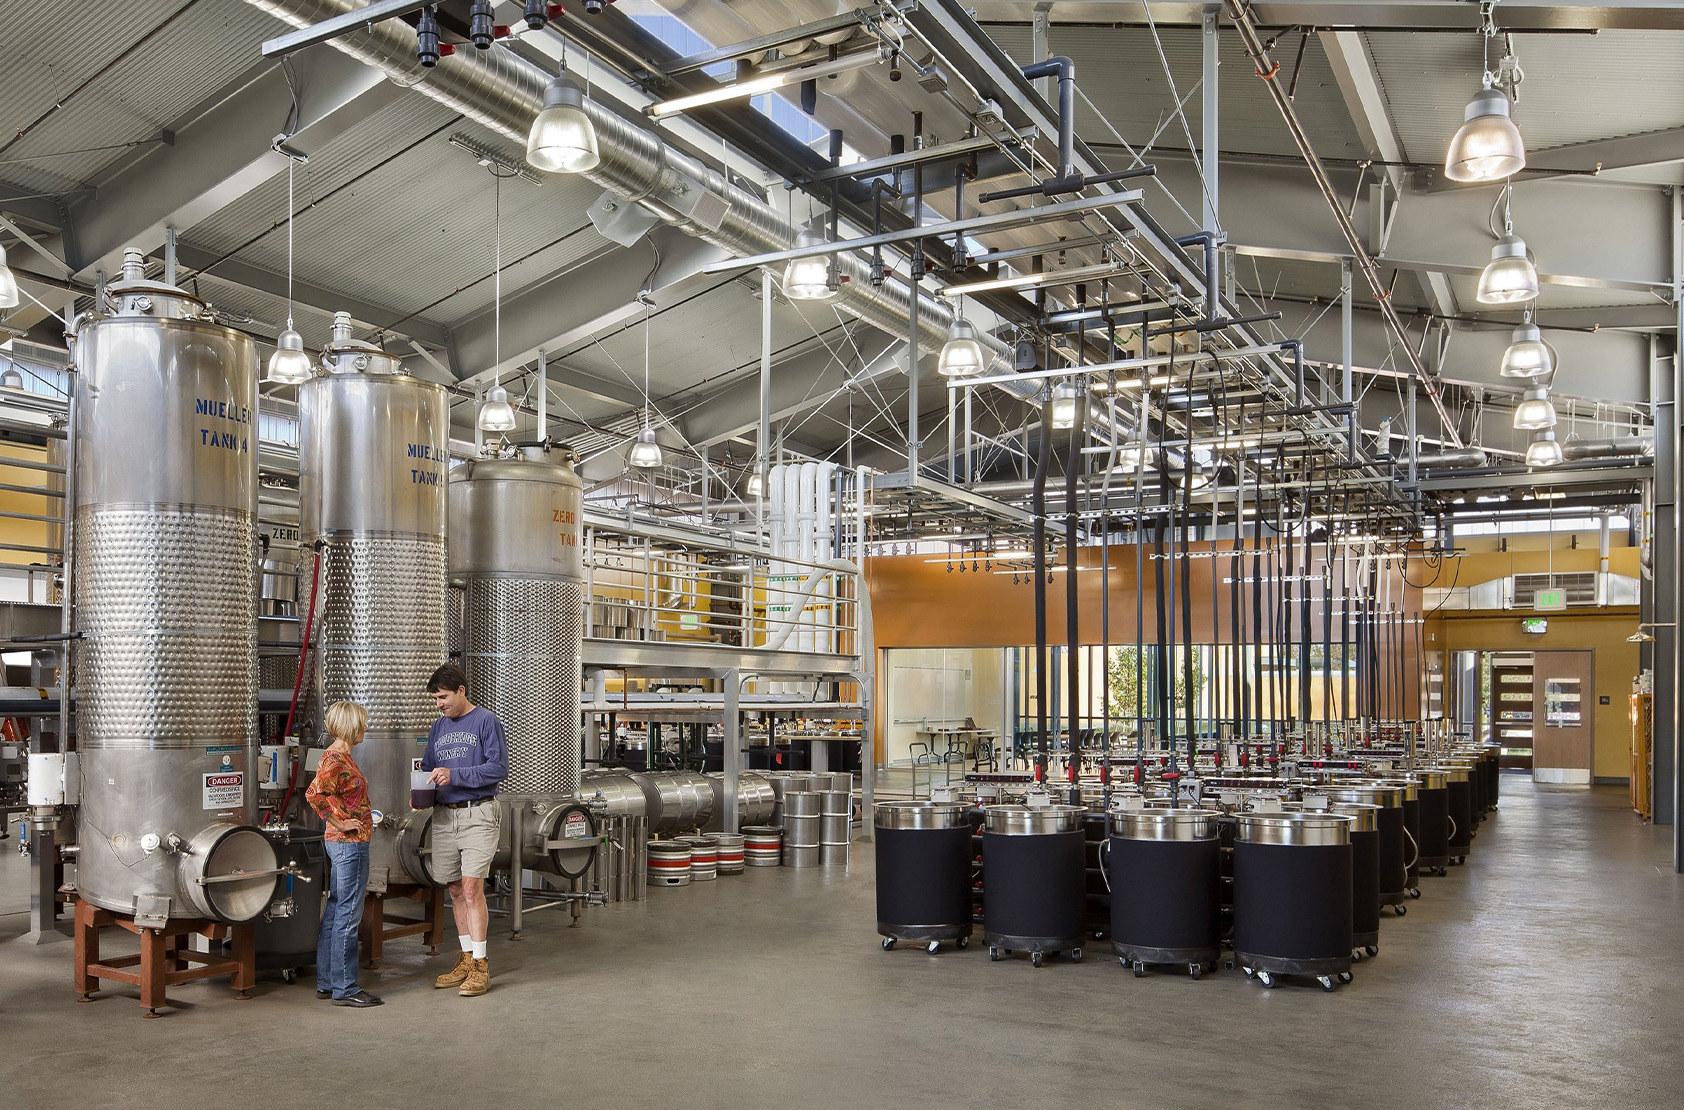 University of California, Davis - Winery, Brewery, and Food Science Laboratory